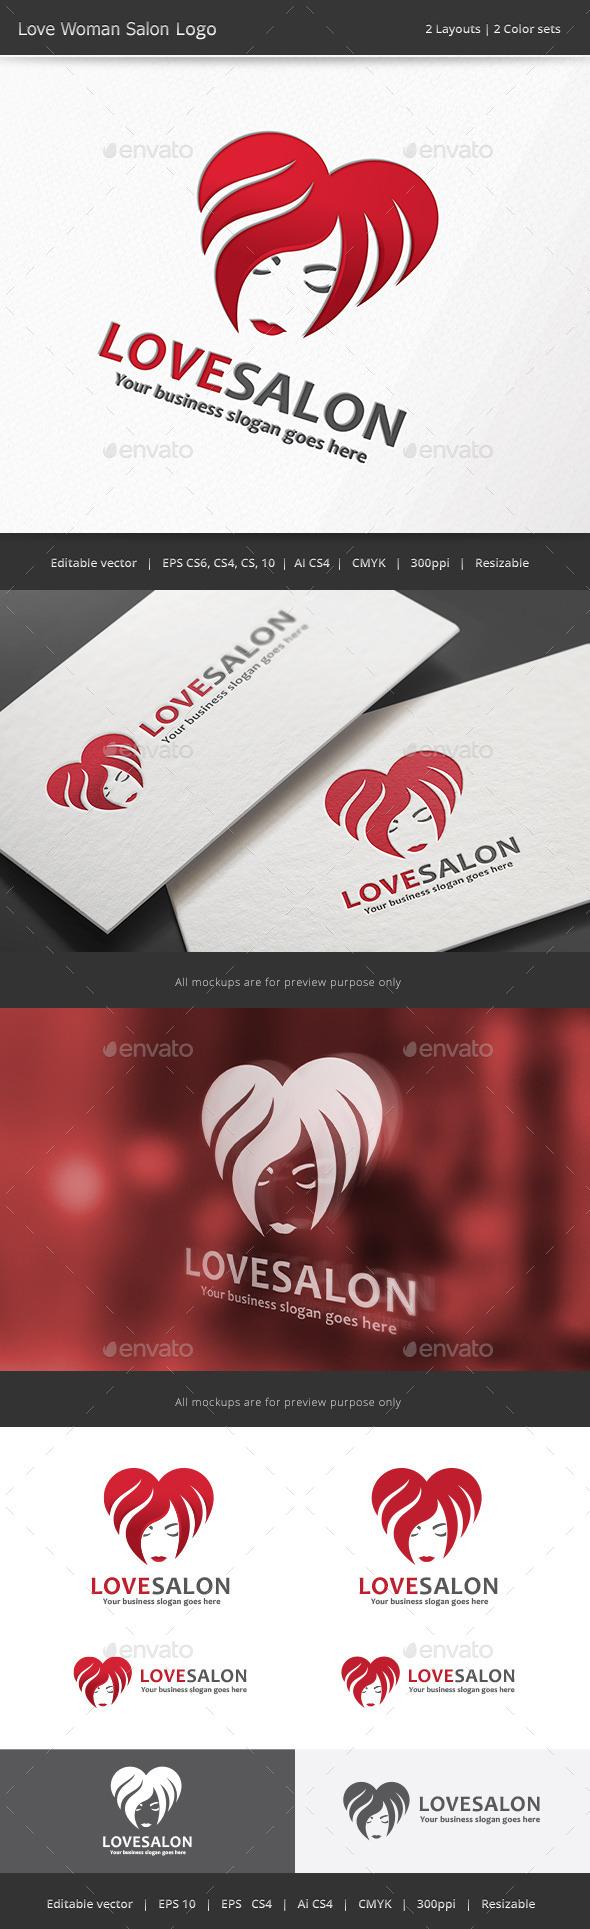 Love Woman Salon Logo - Humans Logo Templates